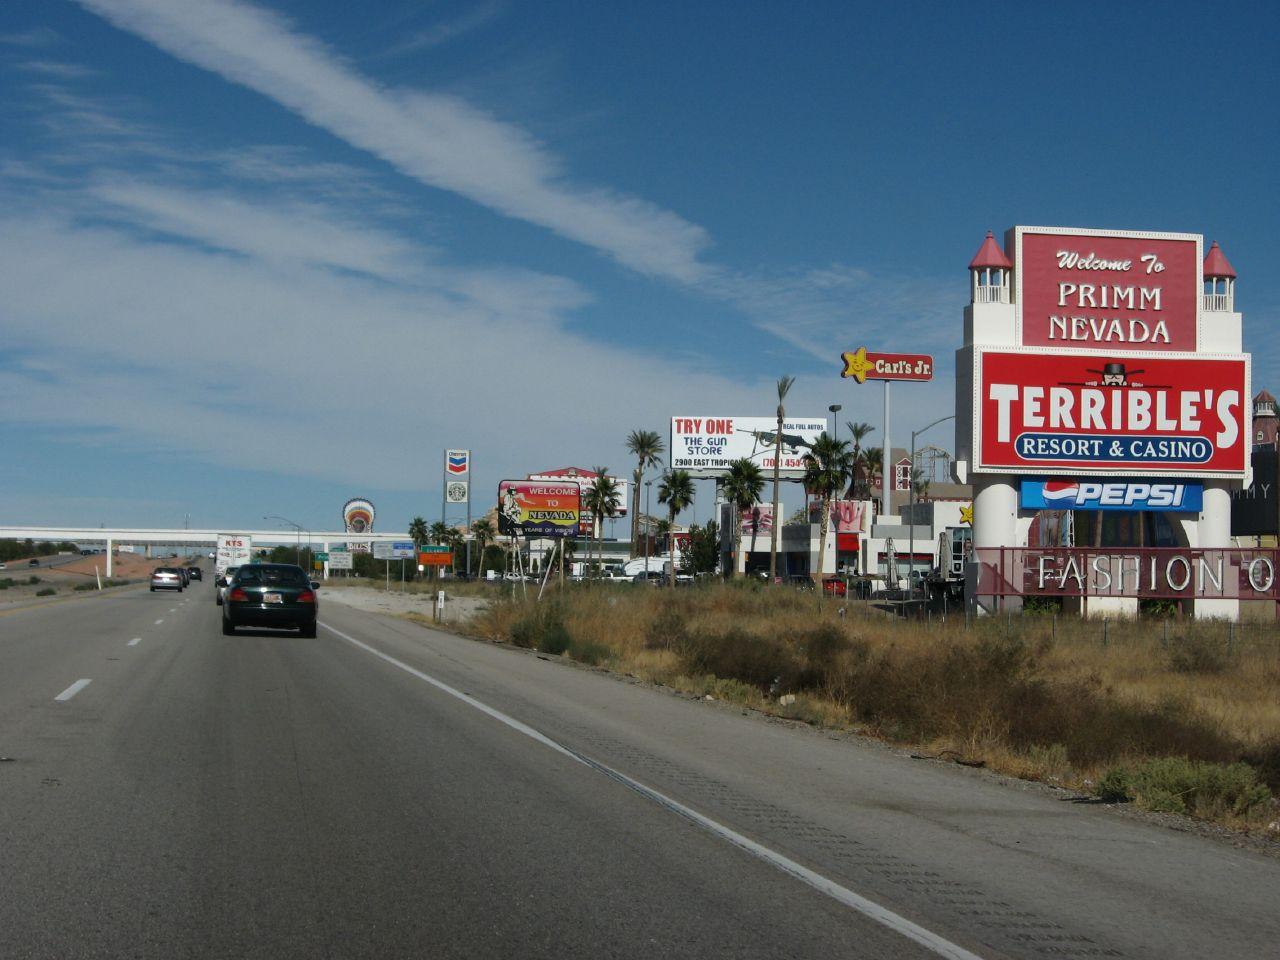 Primm Nevada